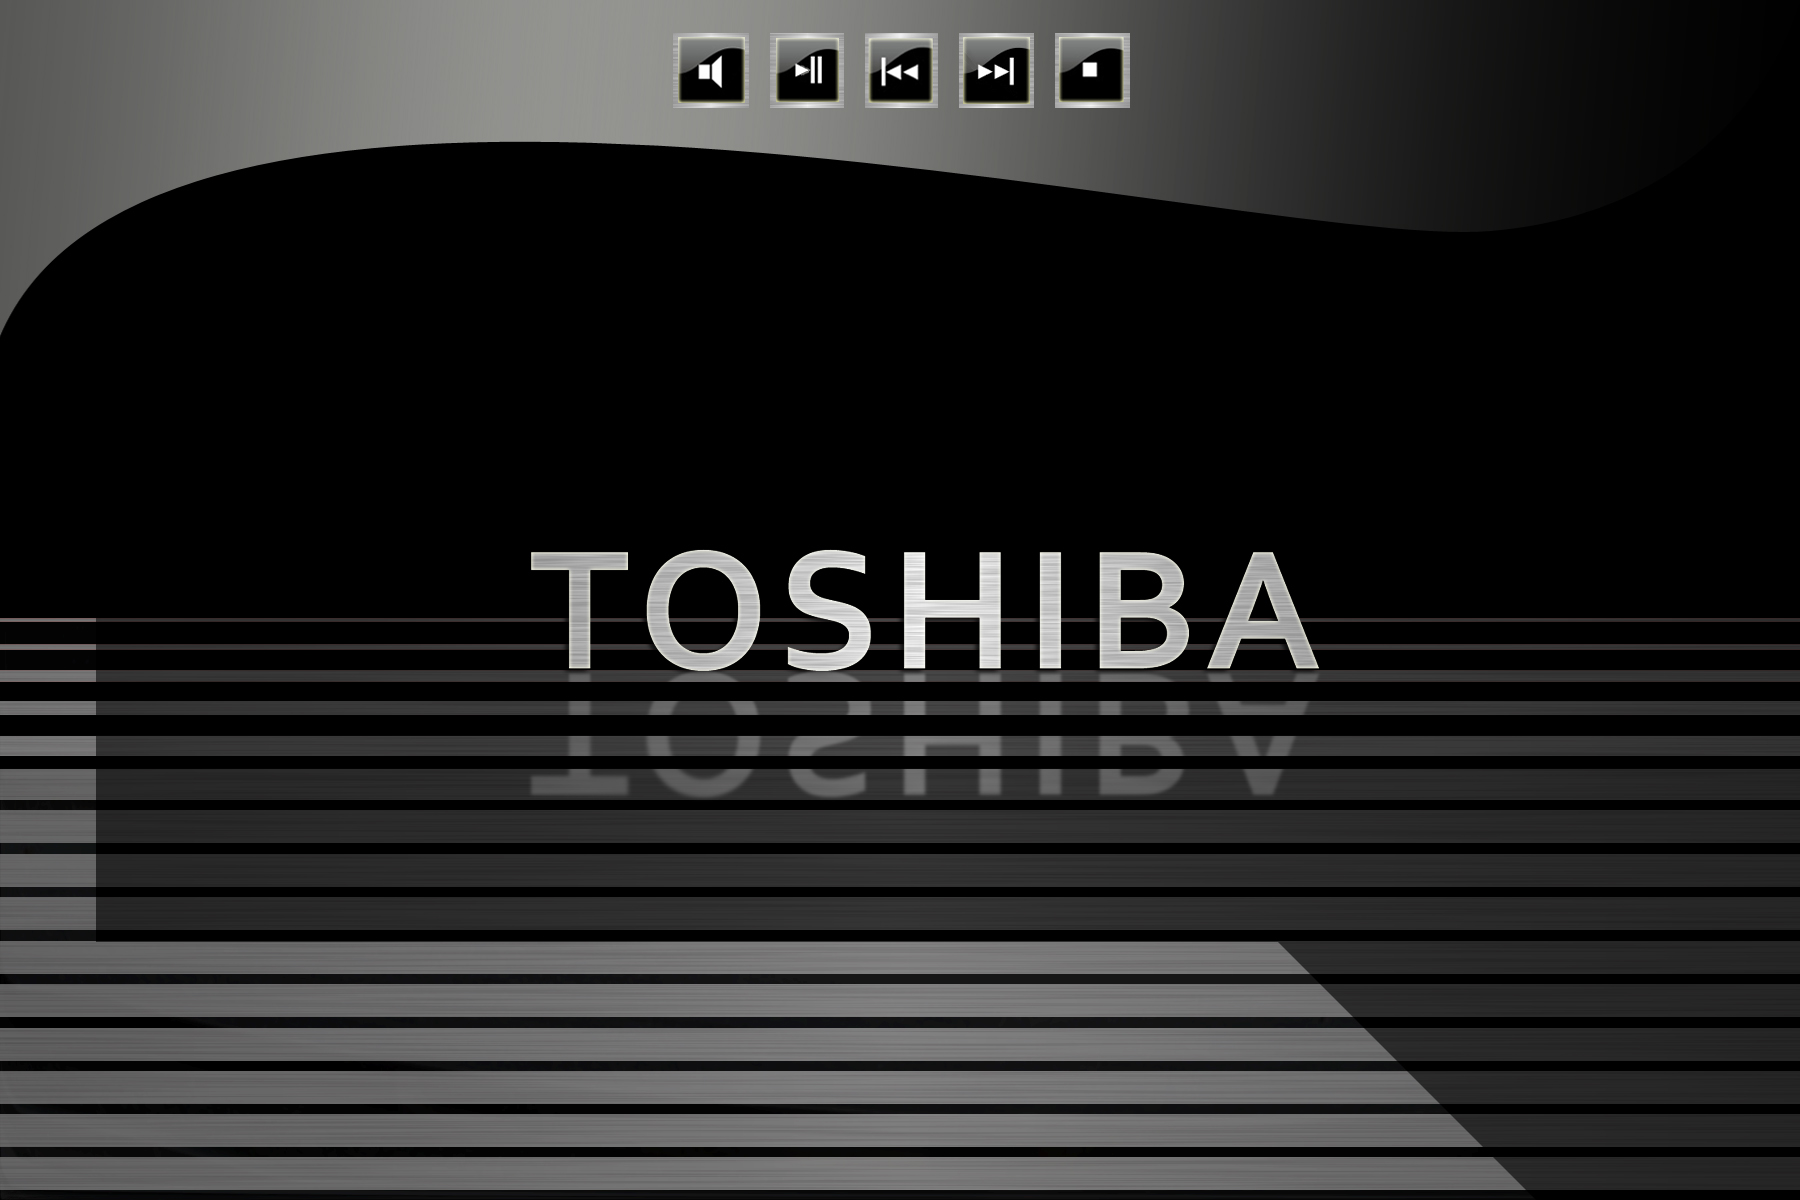 Toshiba wallpaper   ForWallpapercom 1800x1200